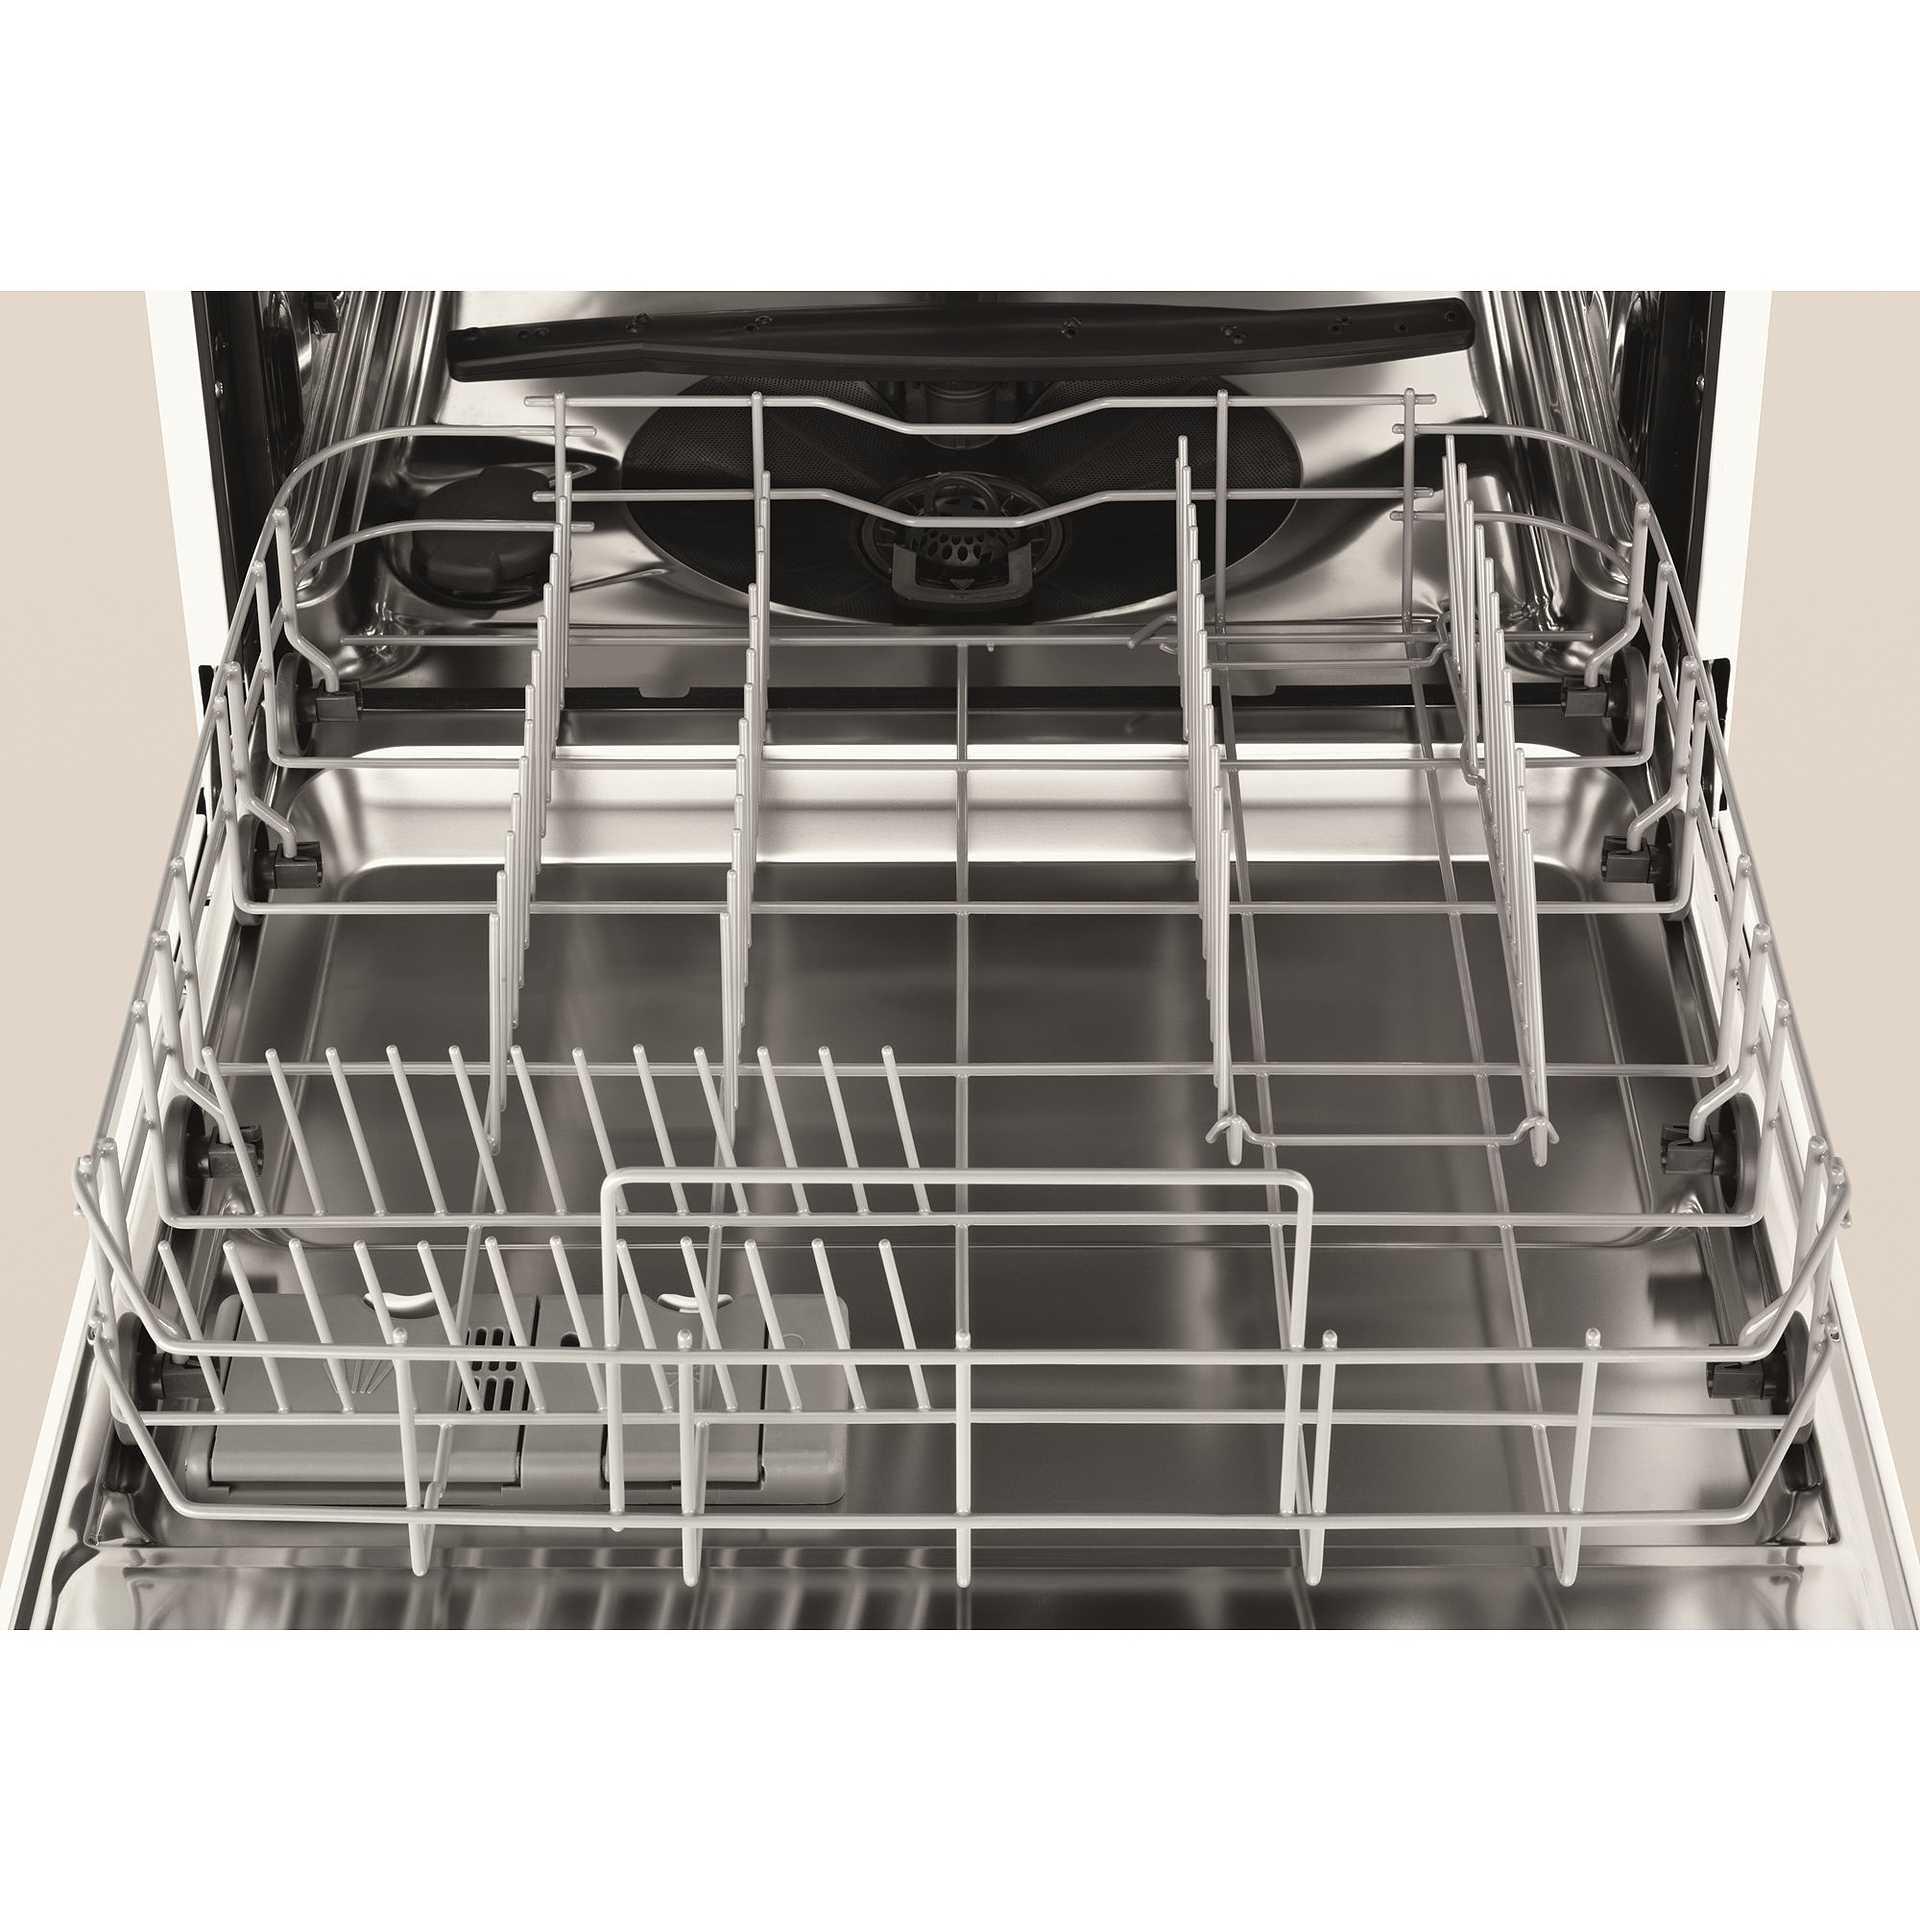 Rex/Electrolux ESL5330LO lavastoviglie da incasso 13 coperti 5 ...